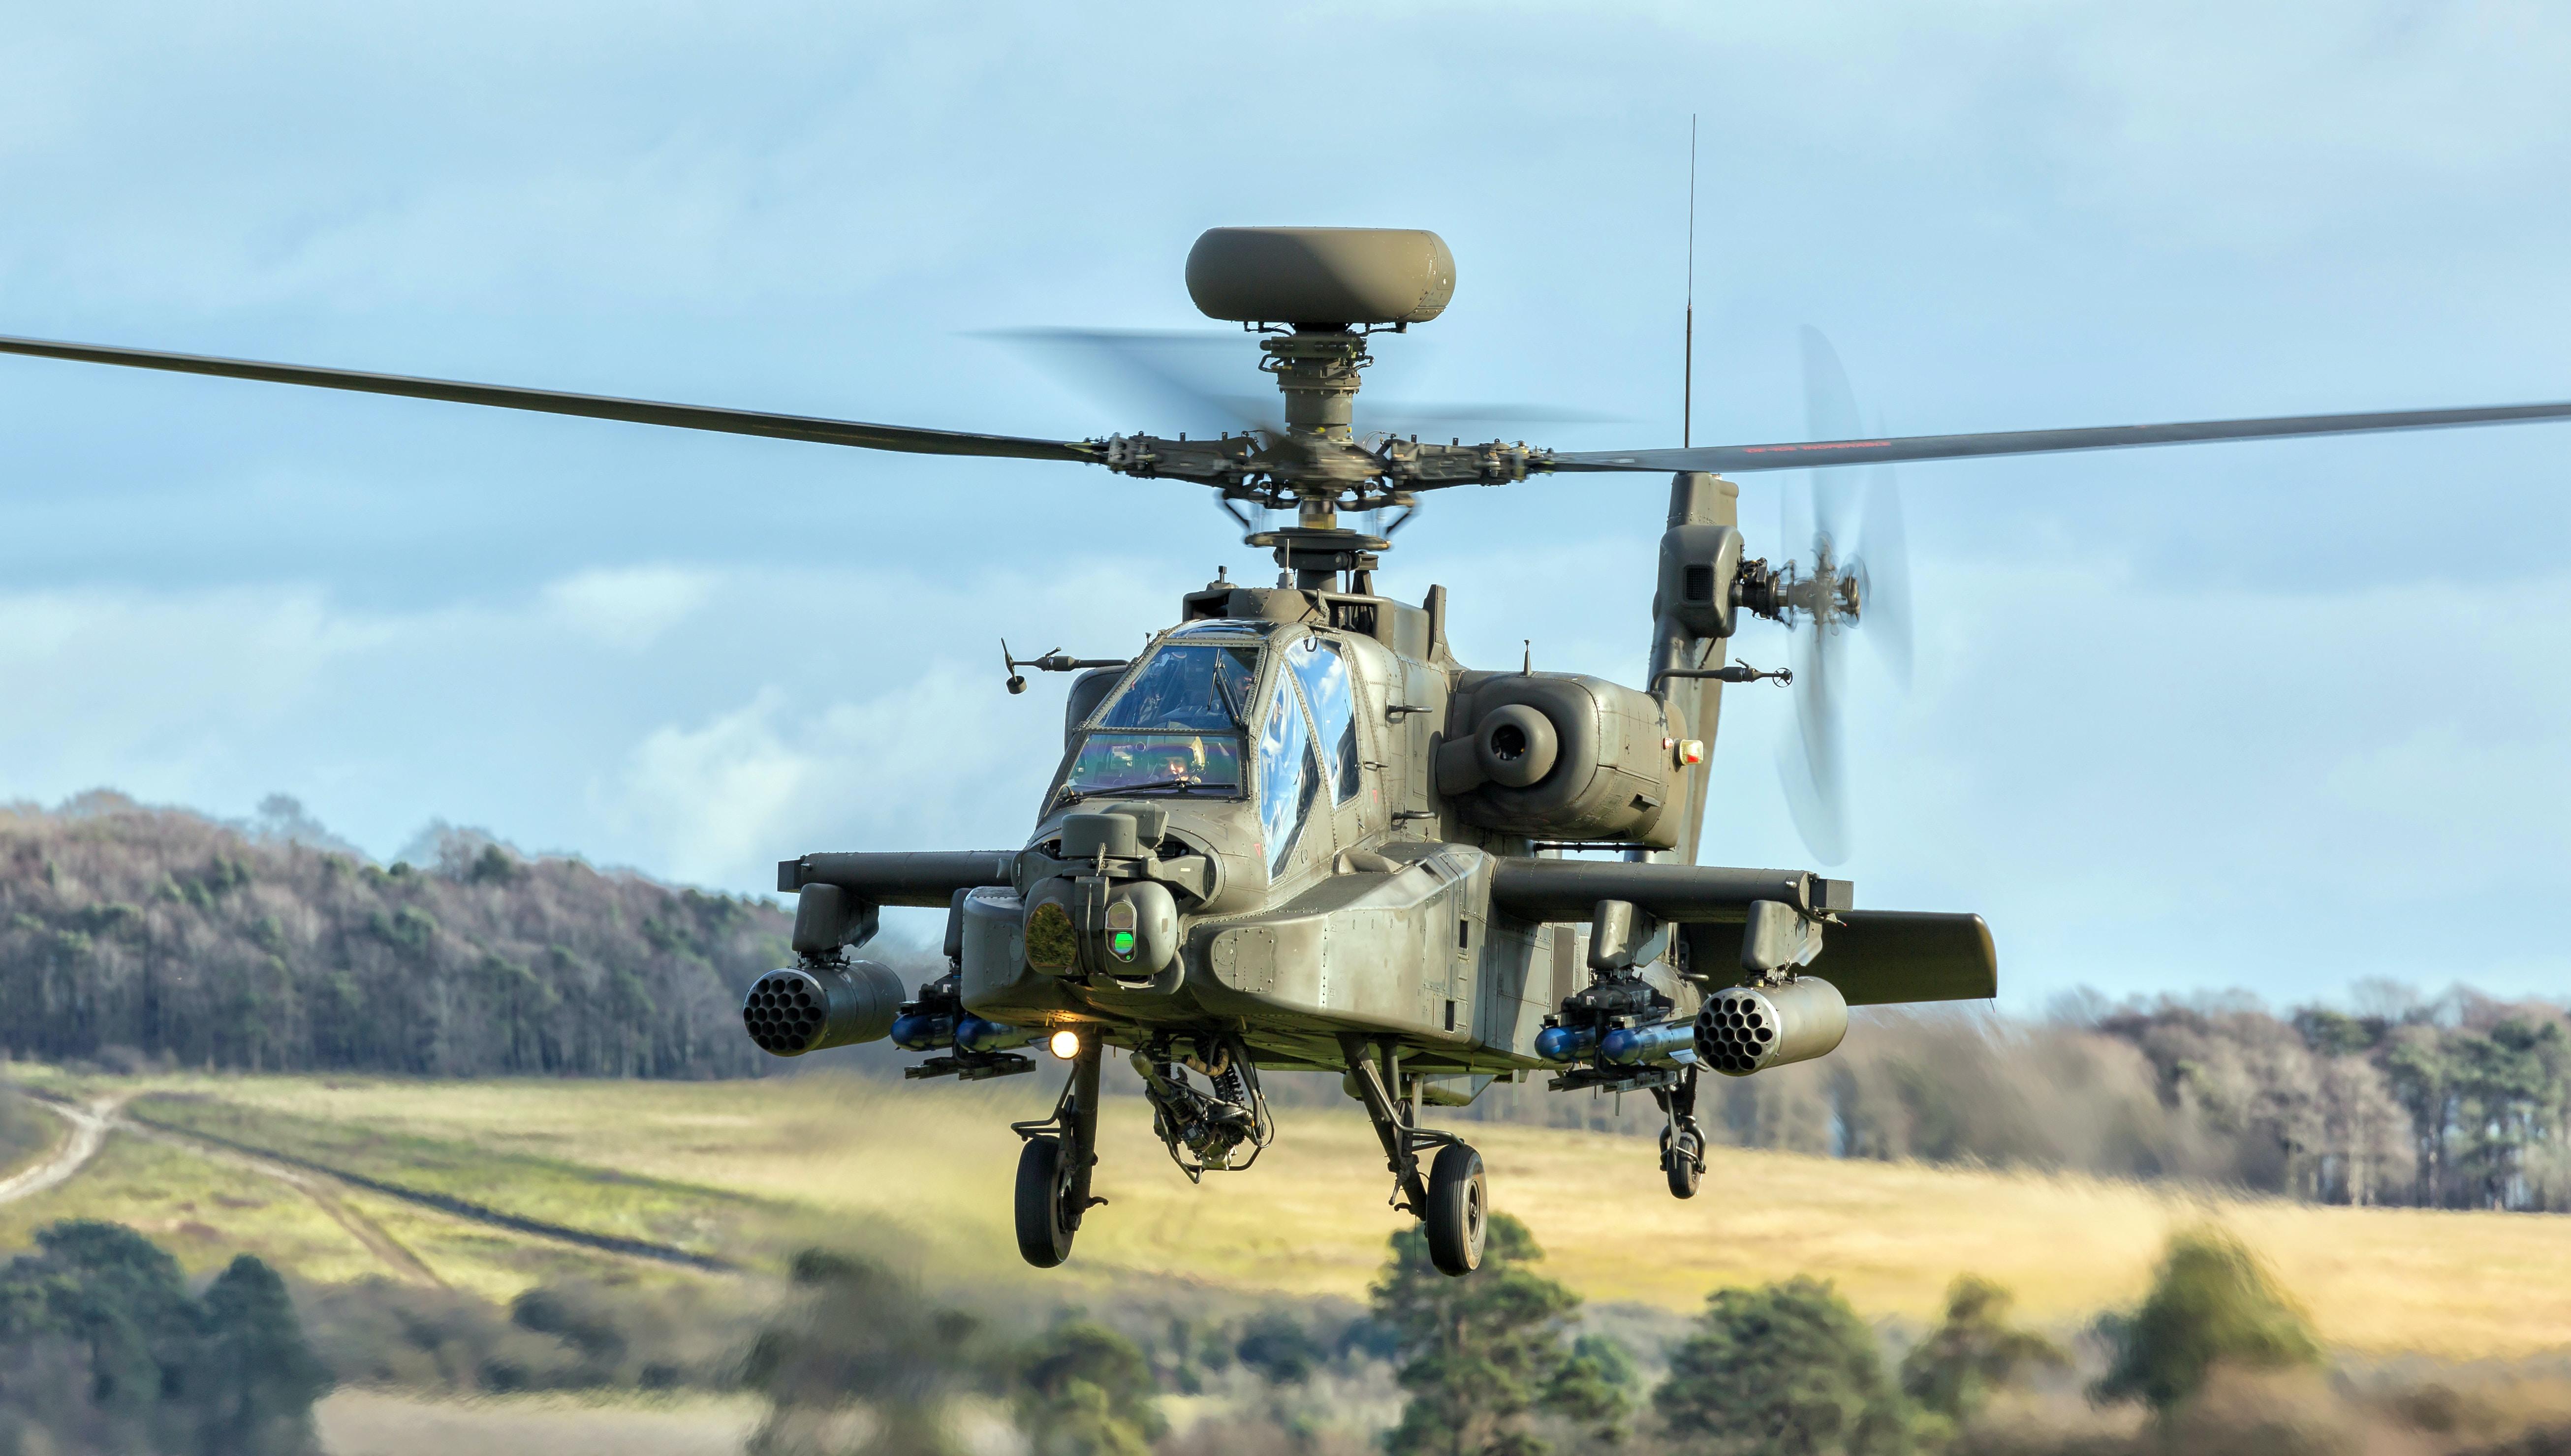 Beschreibung des Fotografen: Apache Longbow helicopter on a training sortie